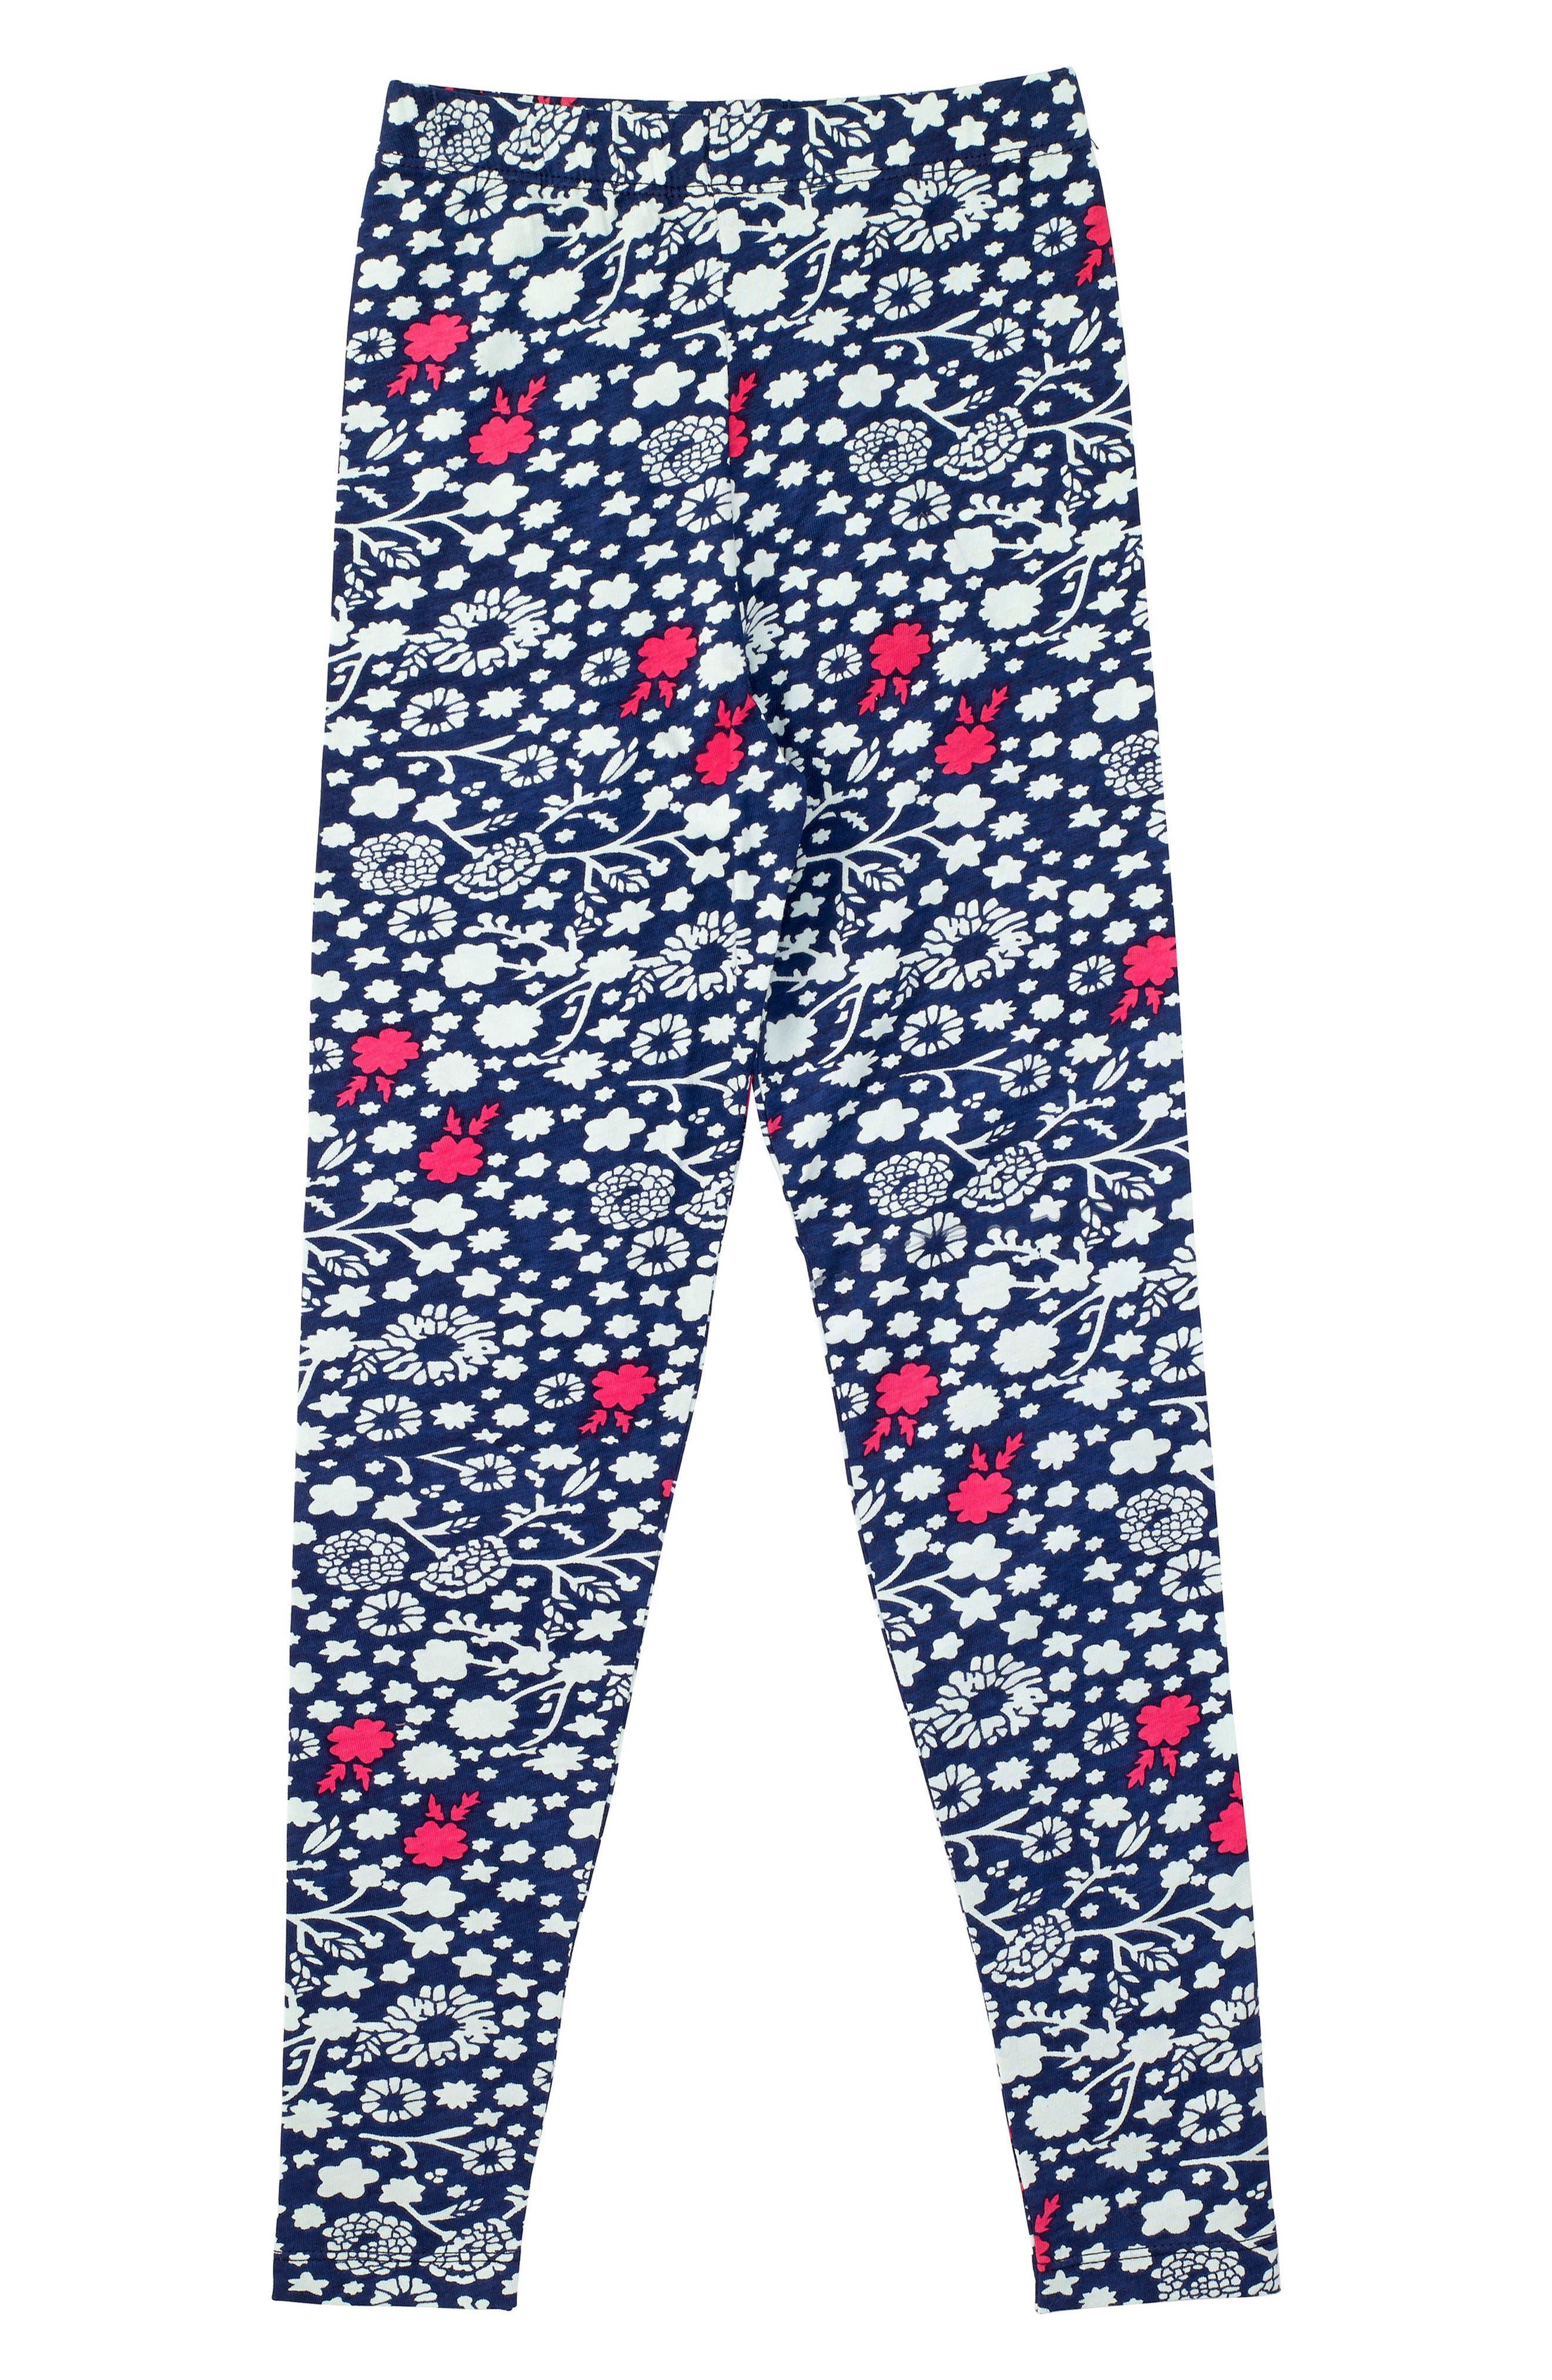 Bloom Organic Cotton Leggings,                             Main thumbnail 1, color,                             Navy